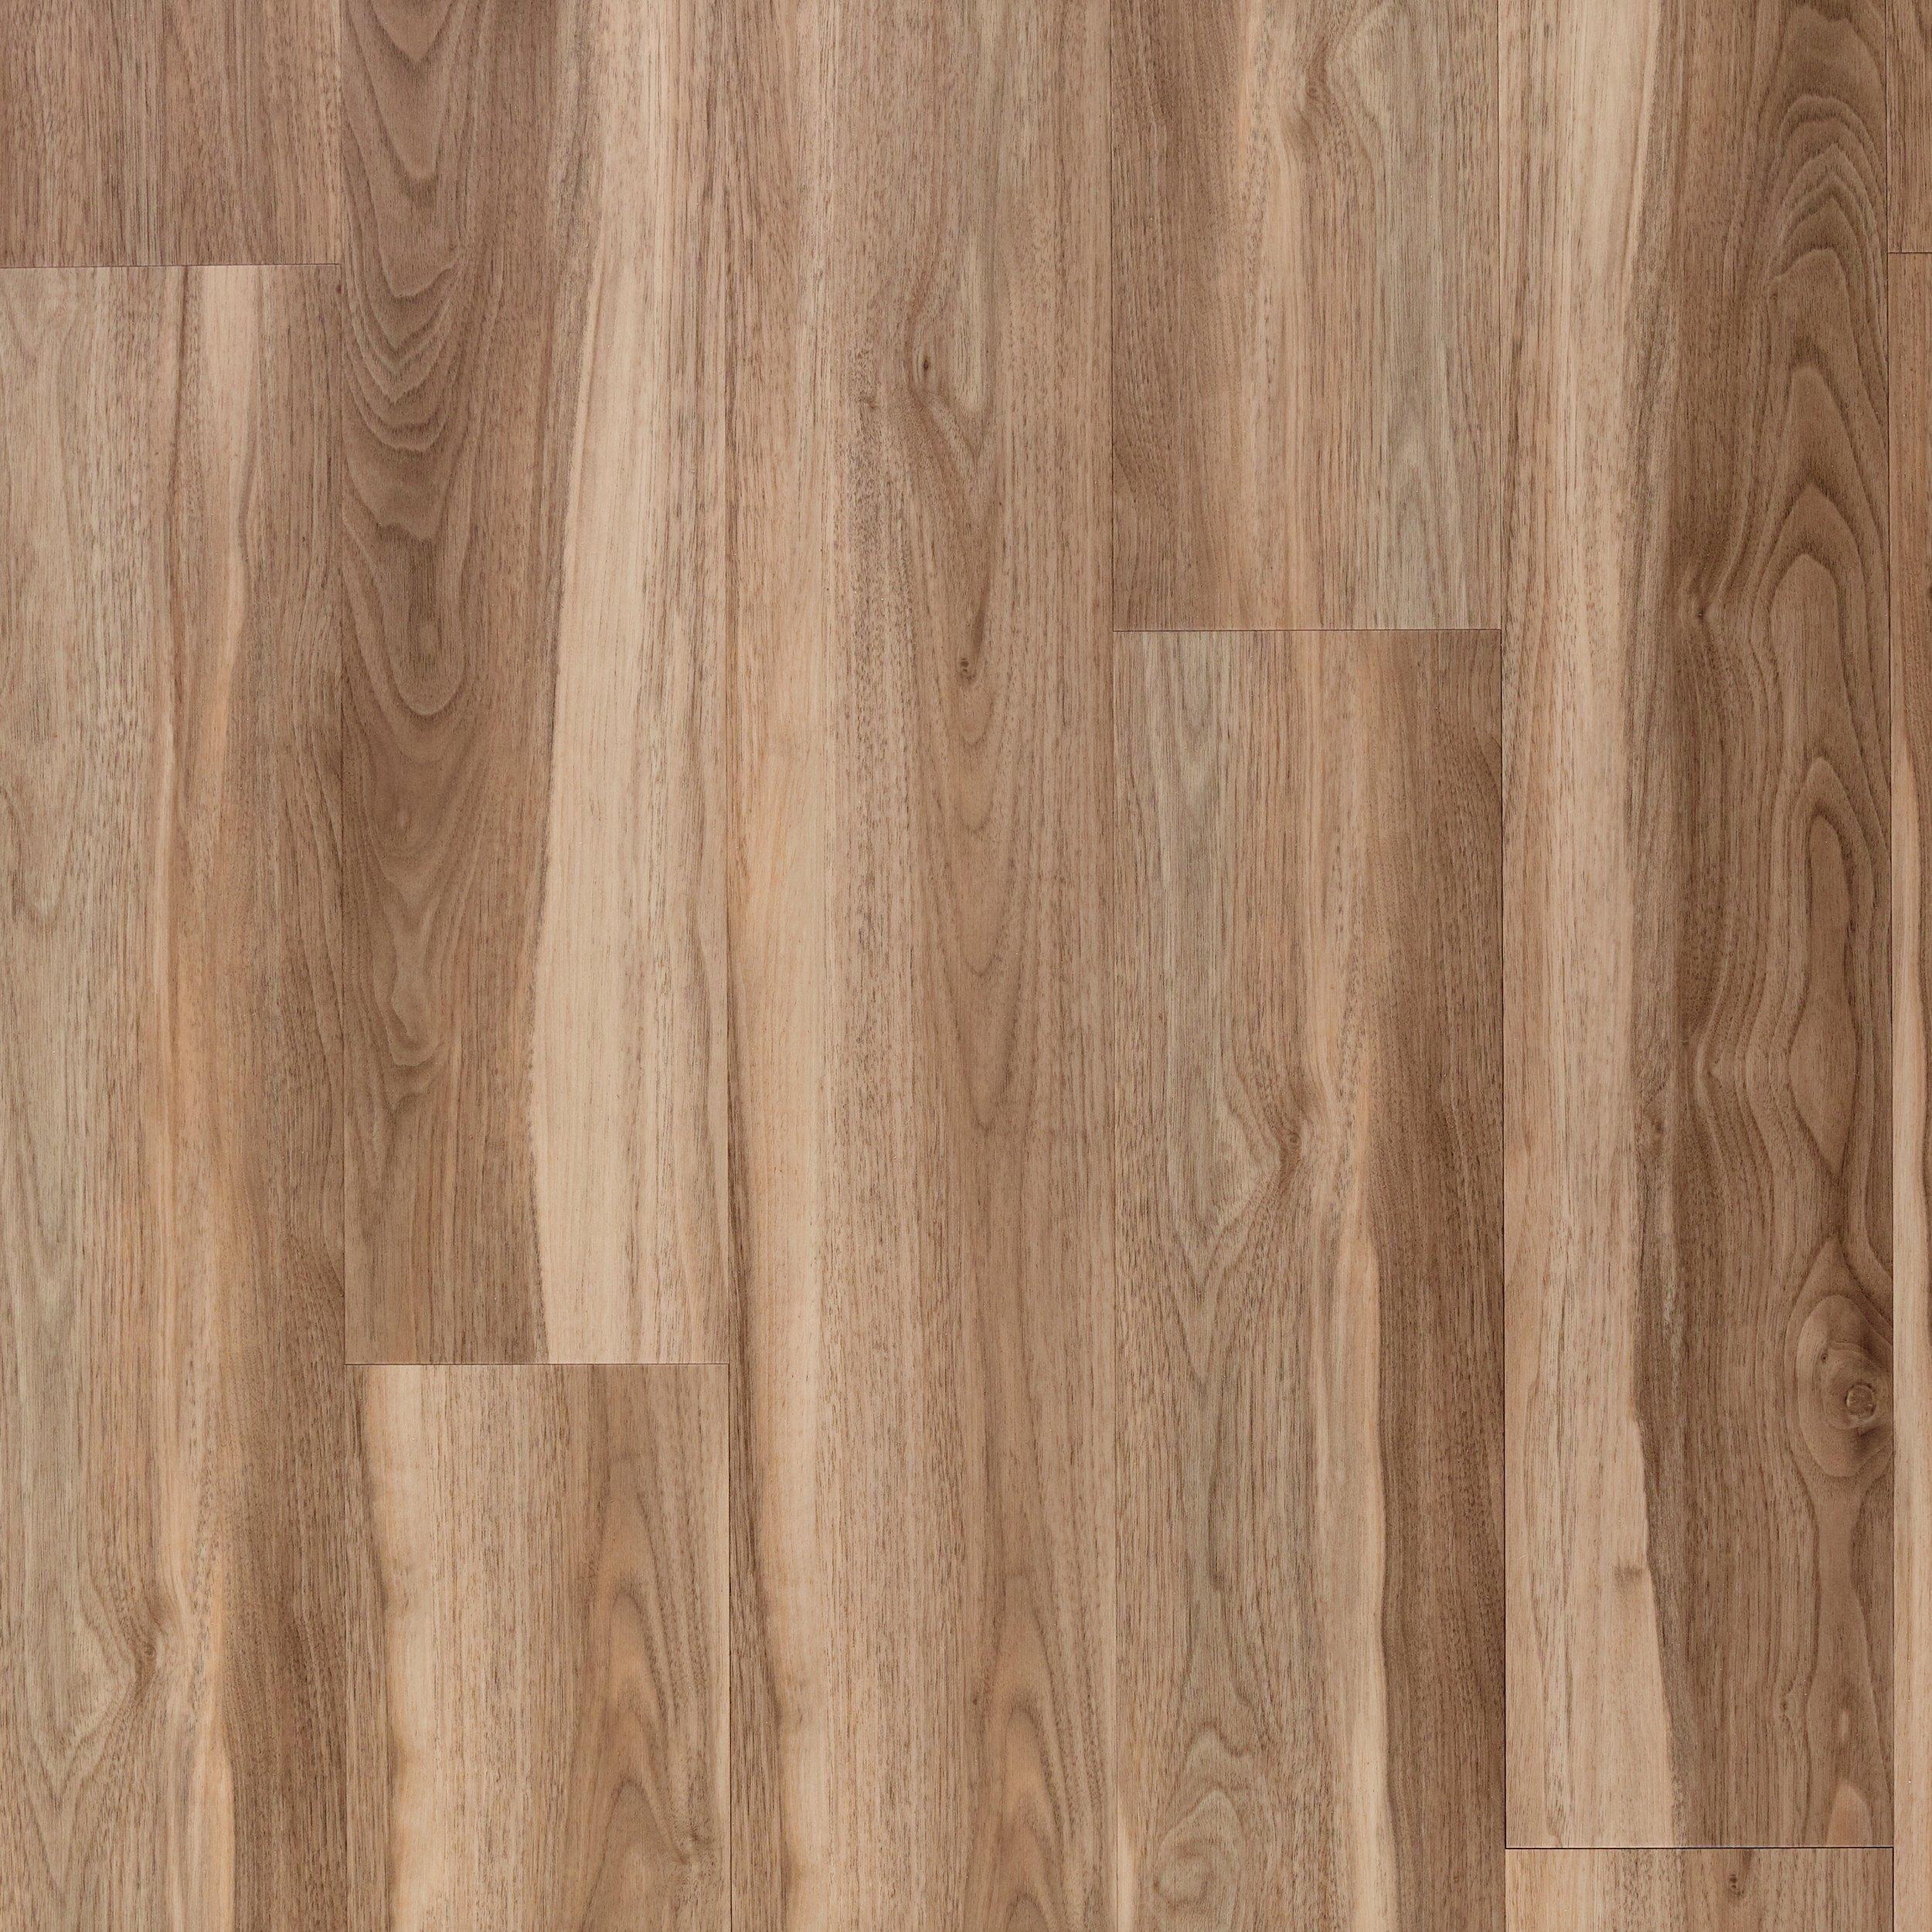 Saddle Walnut Rigid Core Luxury Vinyl Plank Cork Back In 2020 Vinyl Plank Luxury Vinyl Plank Luxury Vinyl